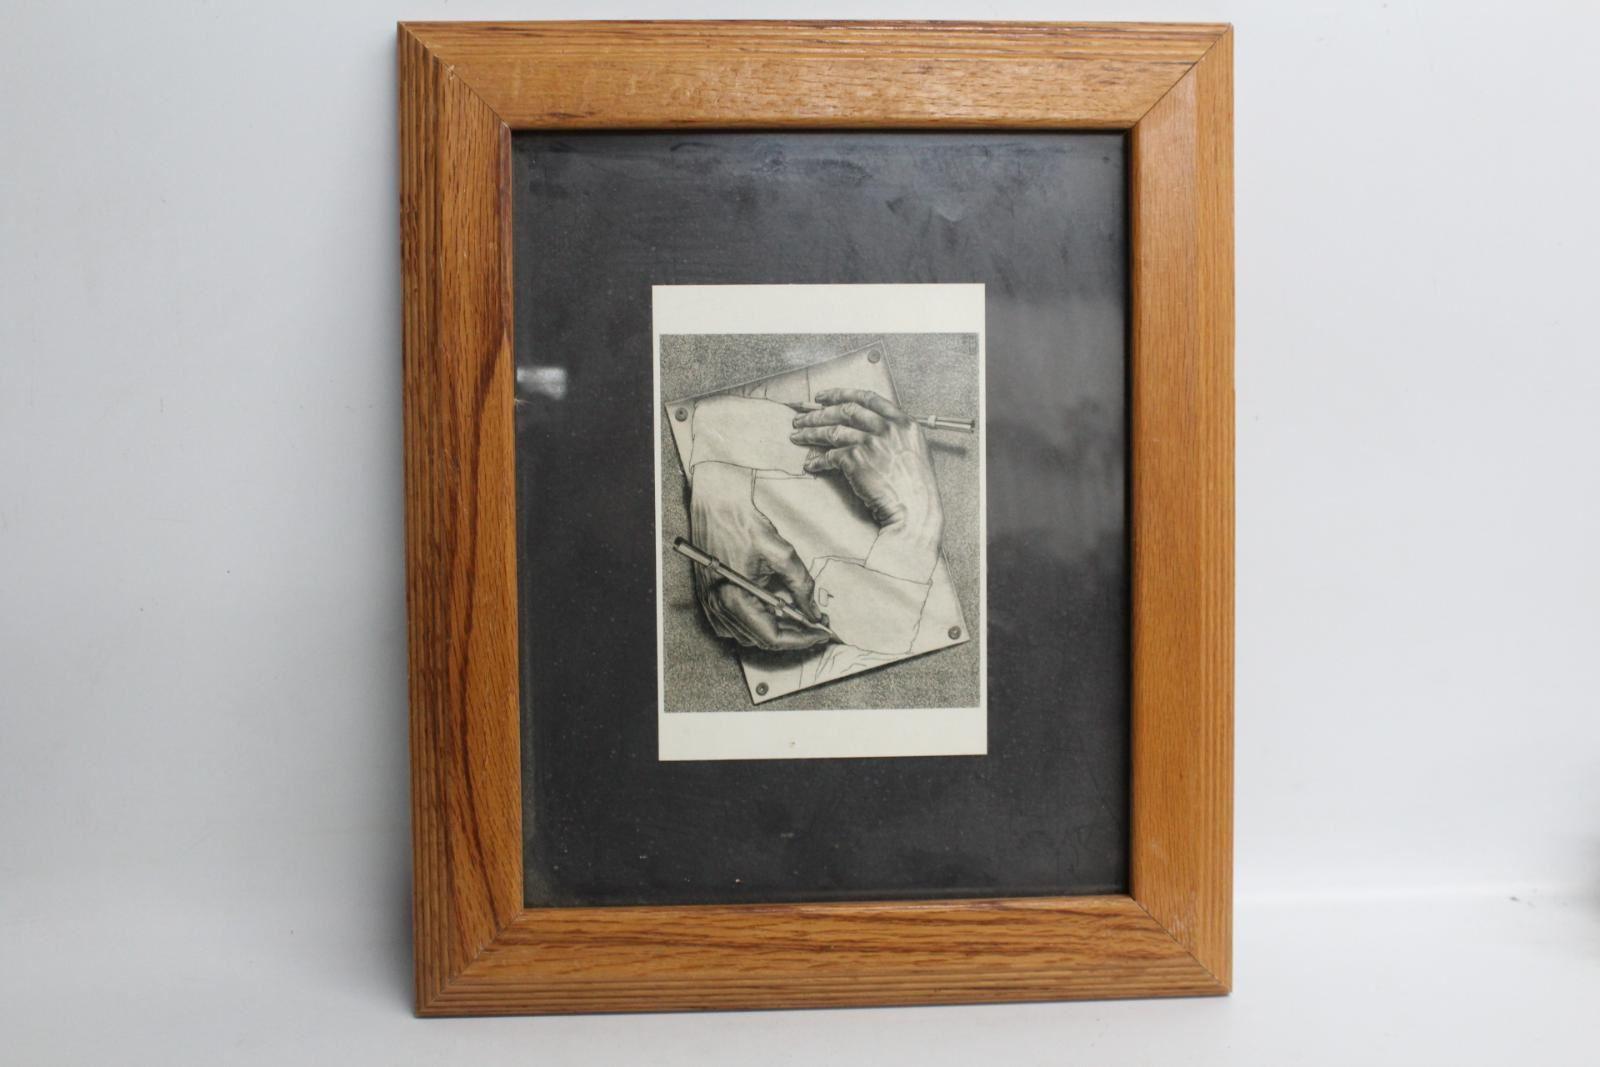 Drawing-Hands-1948-Litho-M-C-Escher-1898-1972-Print-Framed-Oak-Wood-Frame